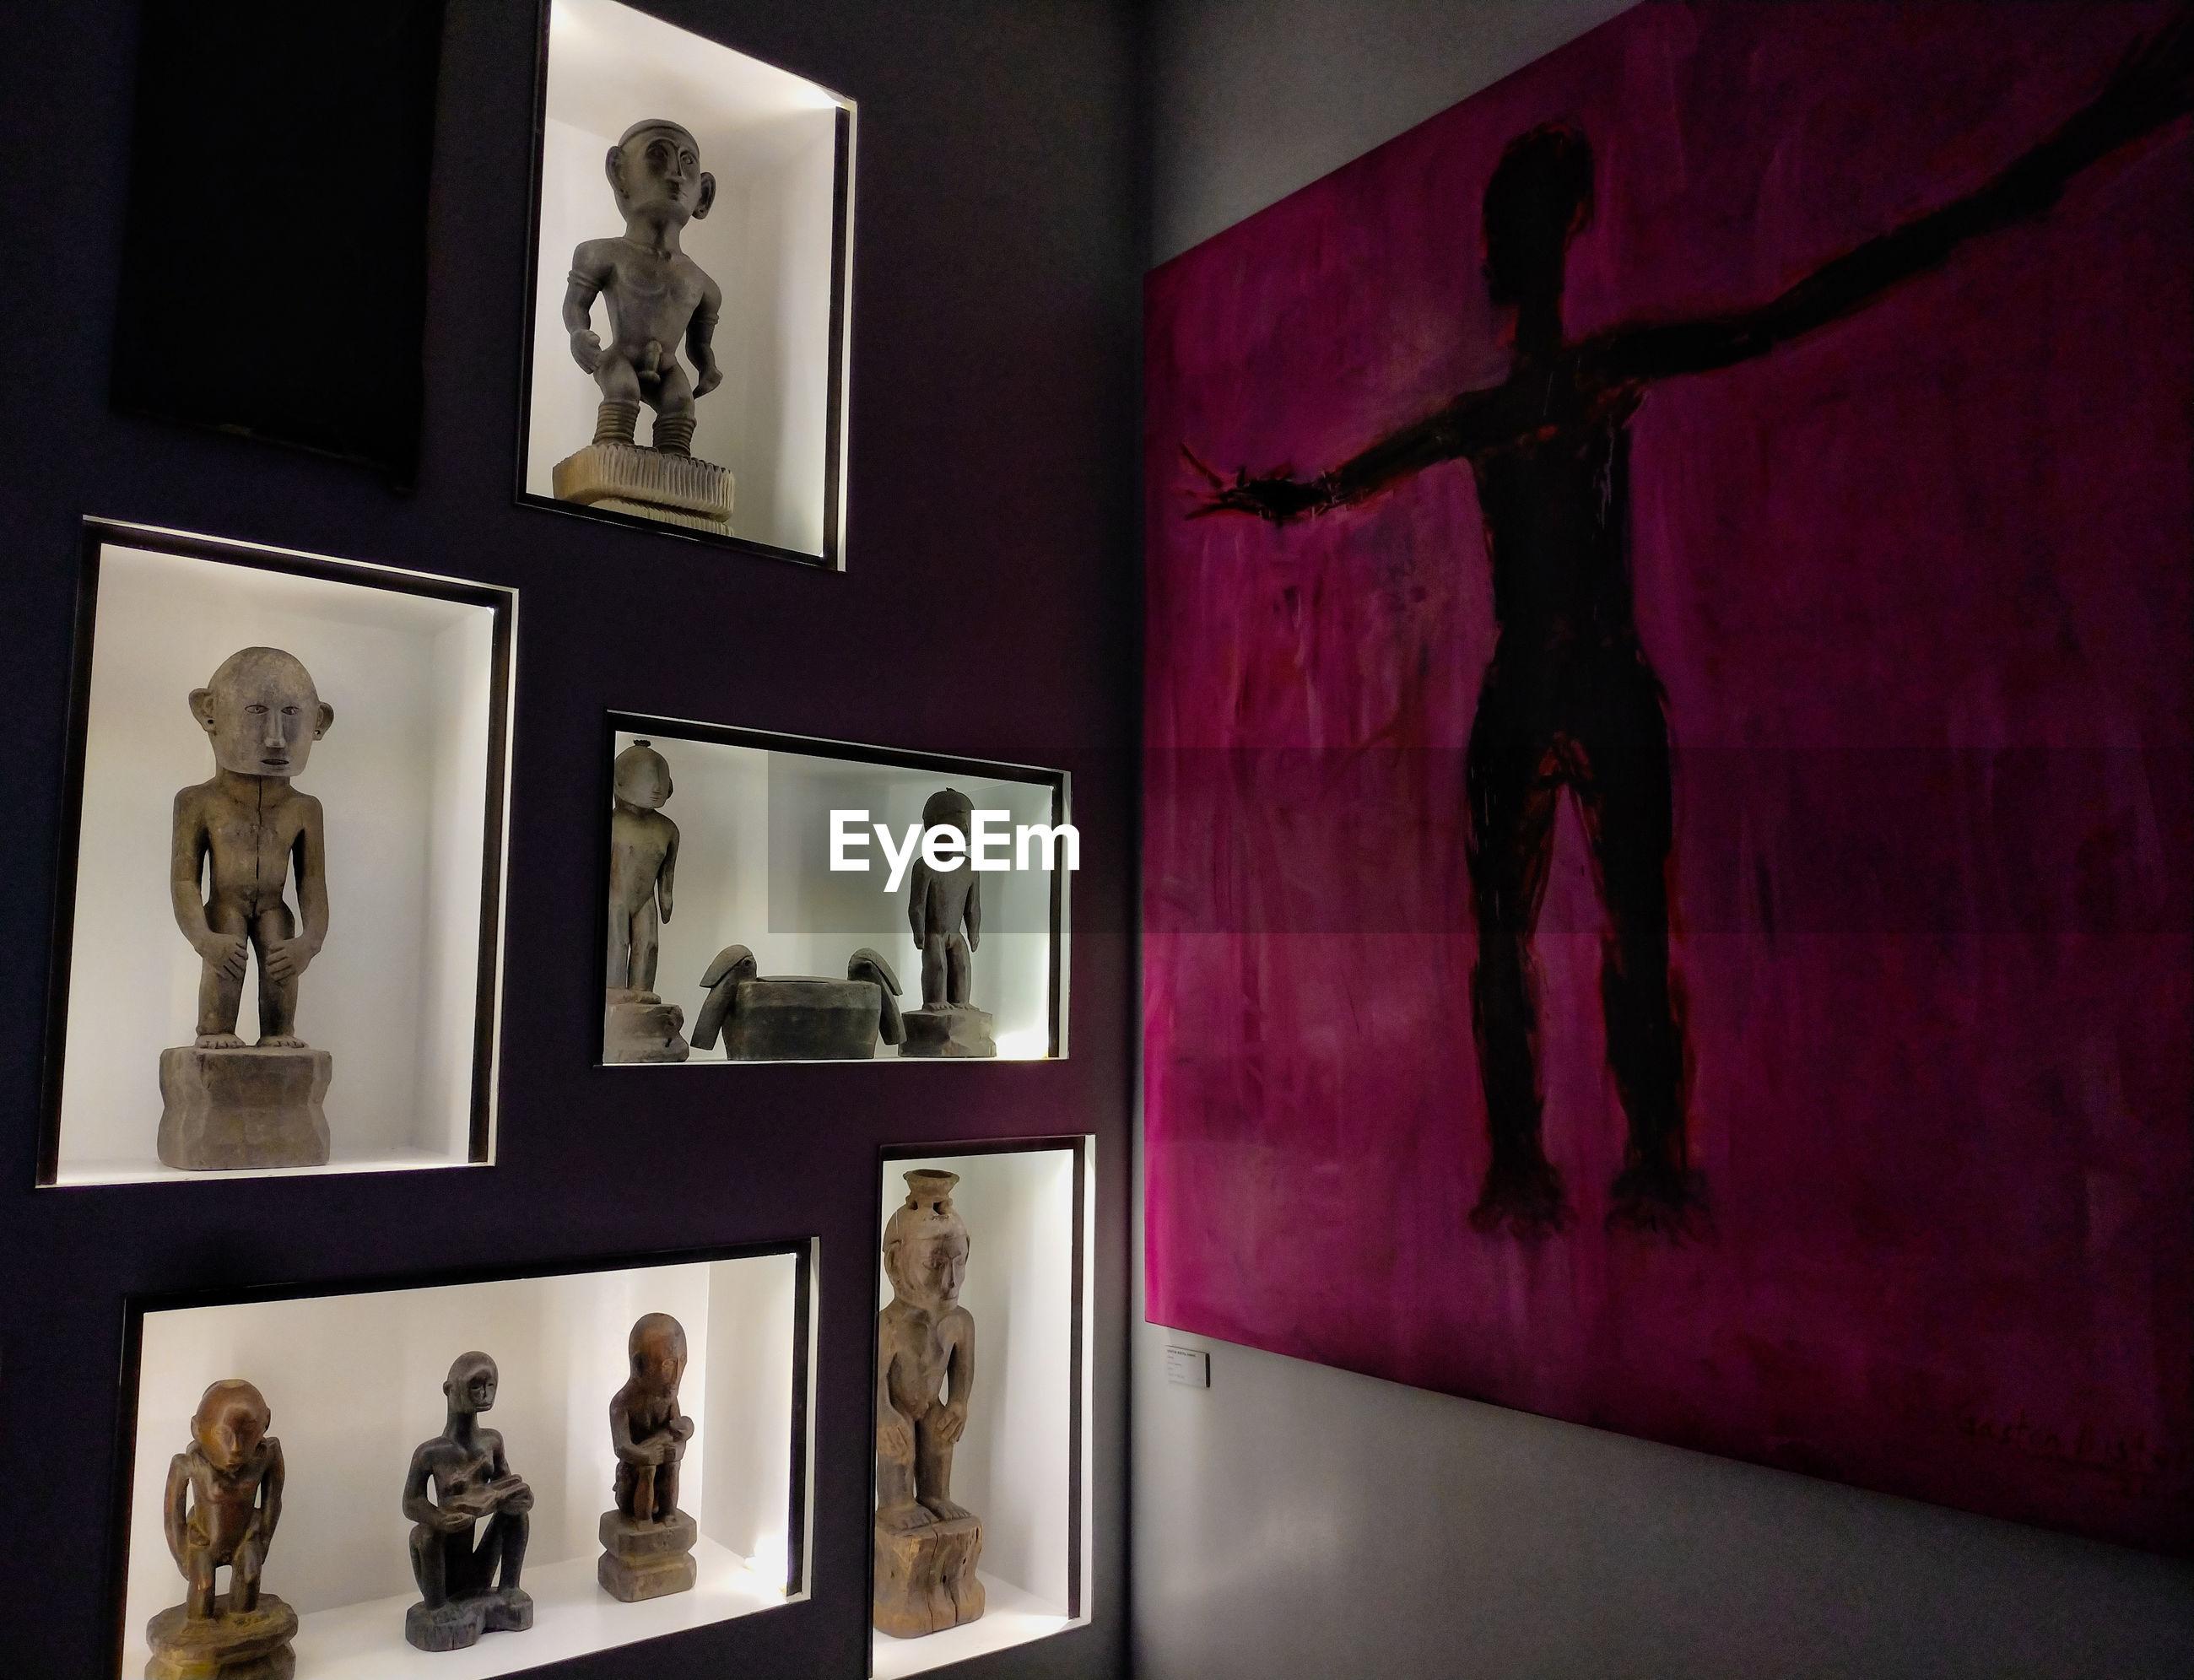 STATUE OF MAN IN MUSEUM